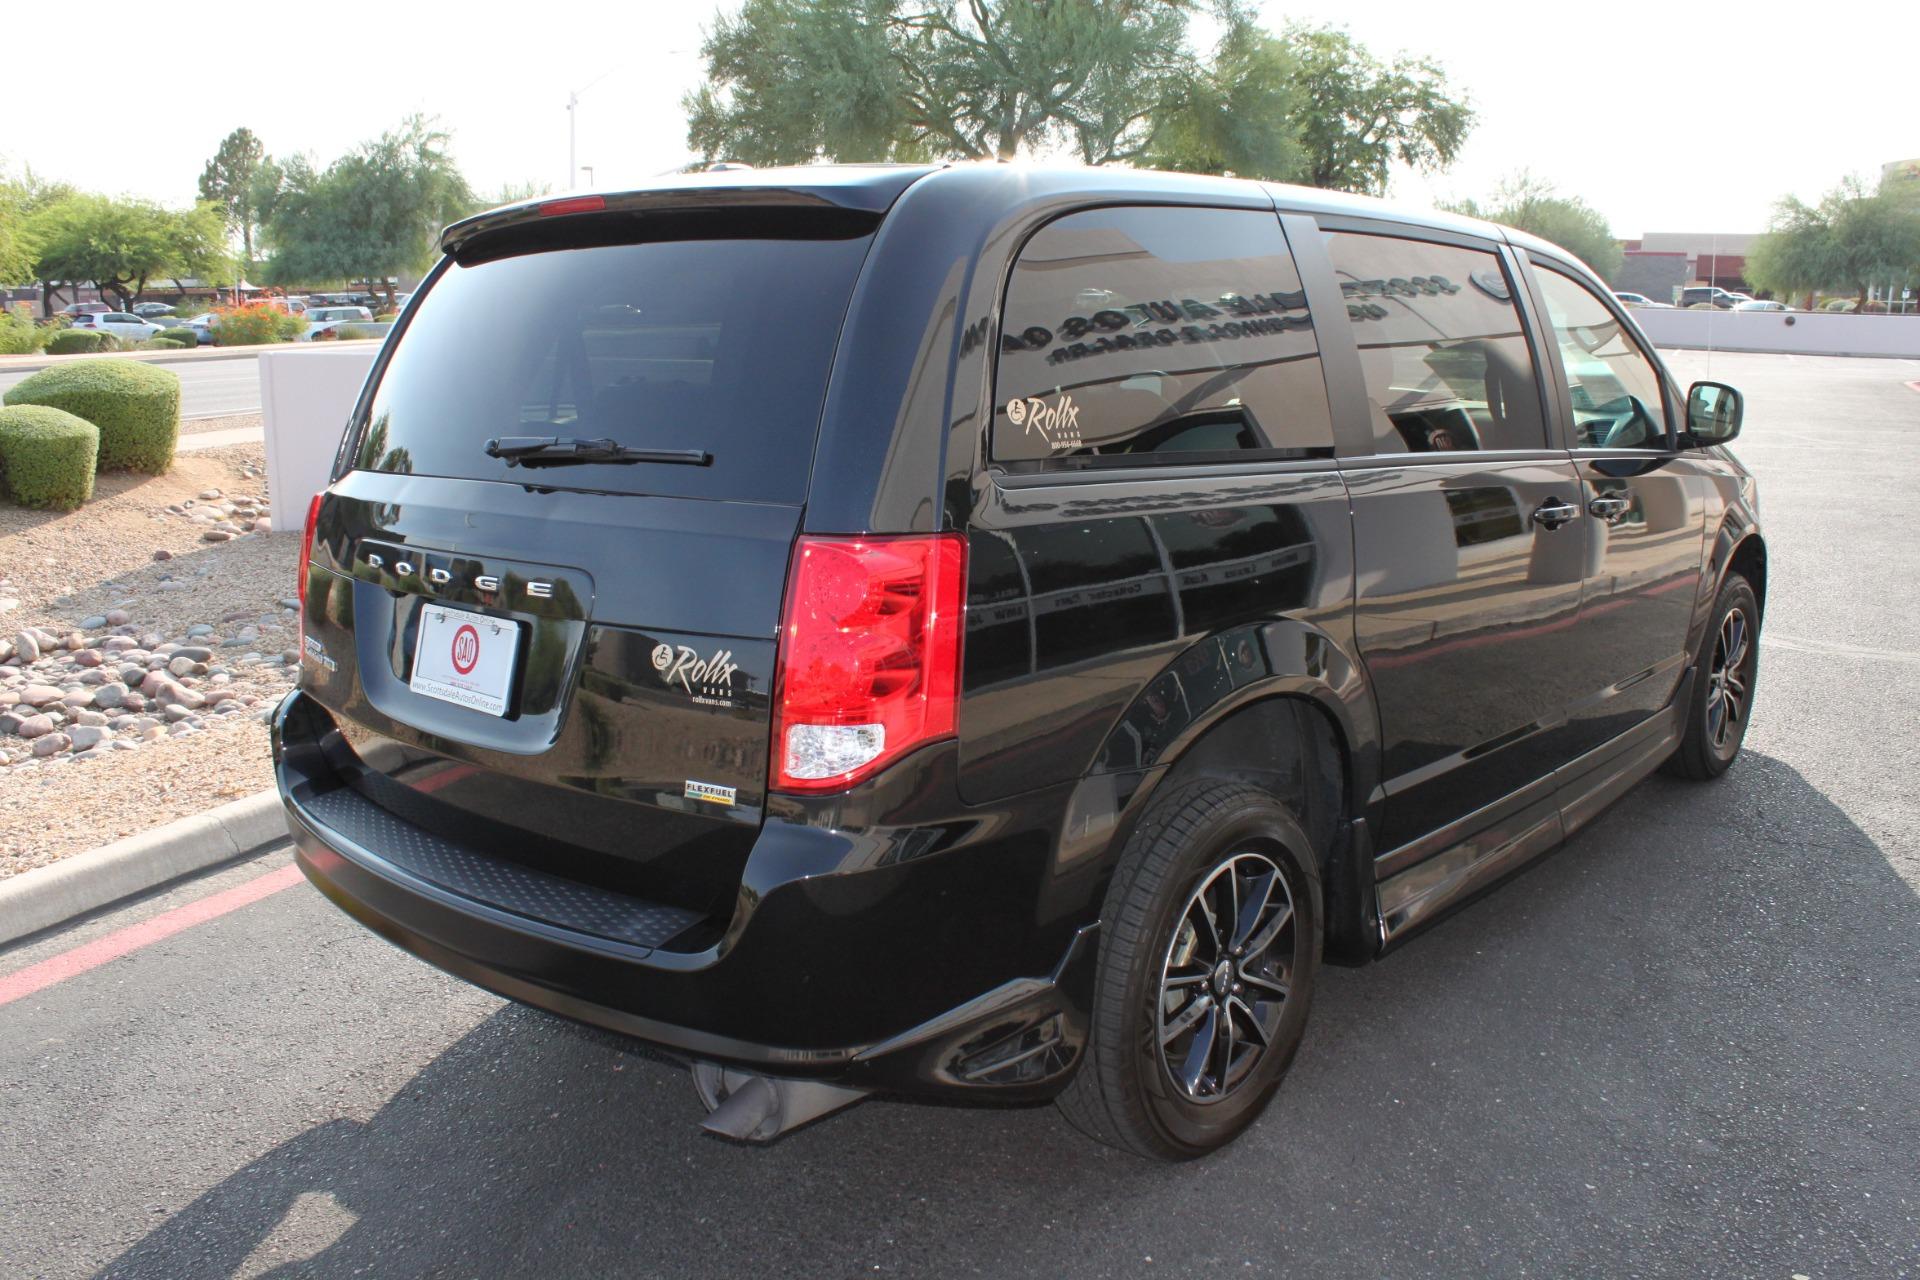 Used-2018-Dodge-Grand-Caravan-SXT-Rollx-Mobility-Conversion-Classic